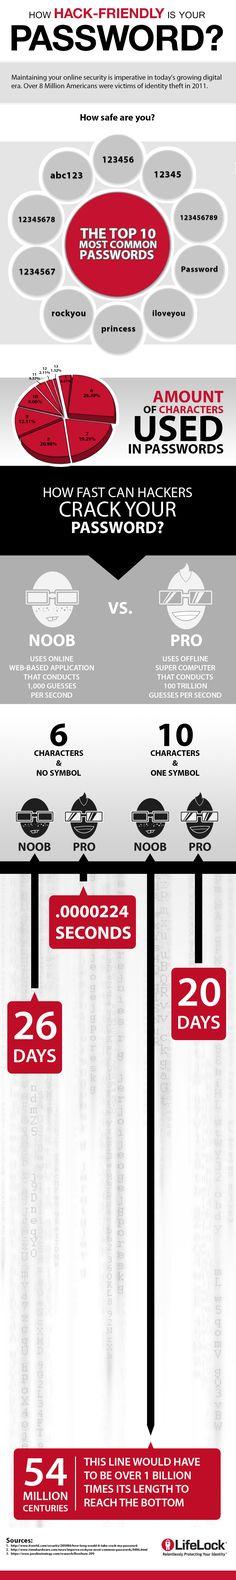 password? #infografia #infographic #internet